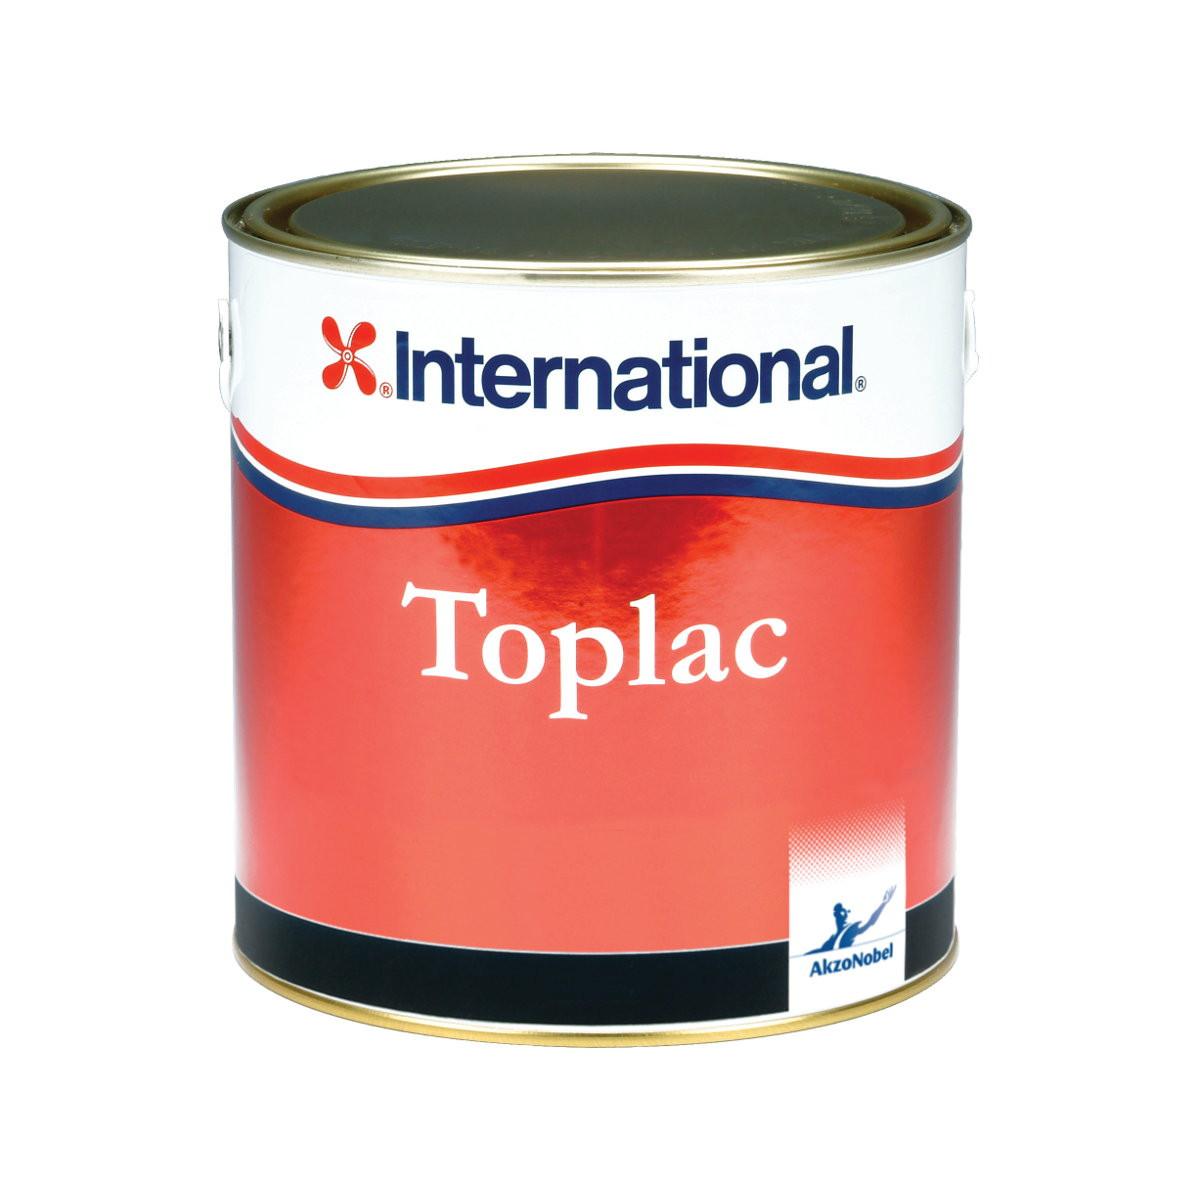 International Toplac aflak - wit 545, 2500ml